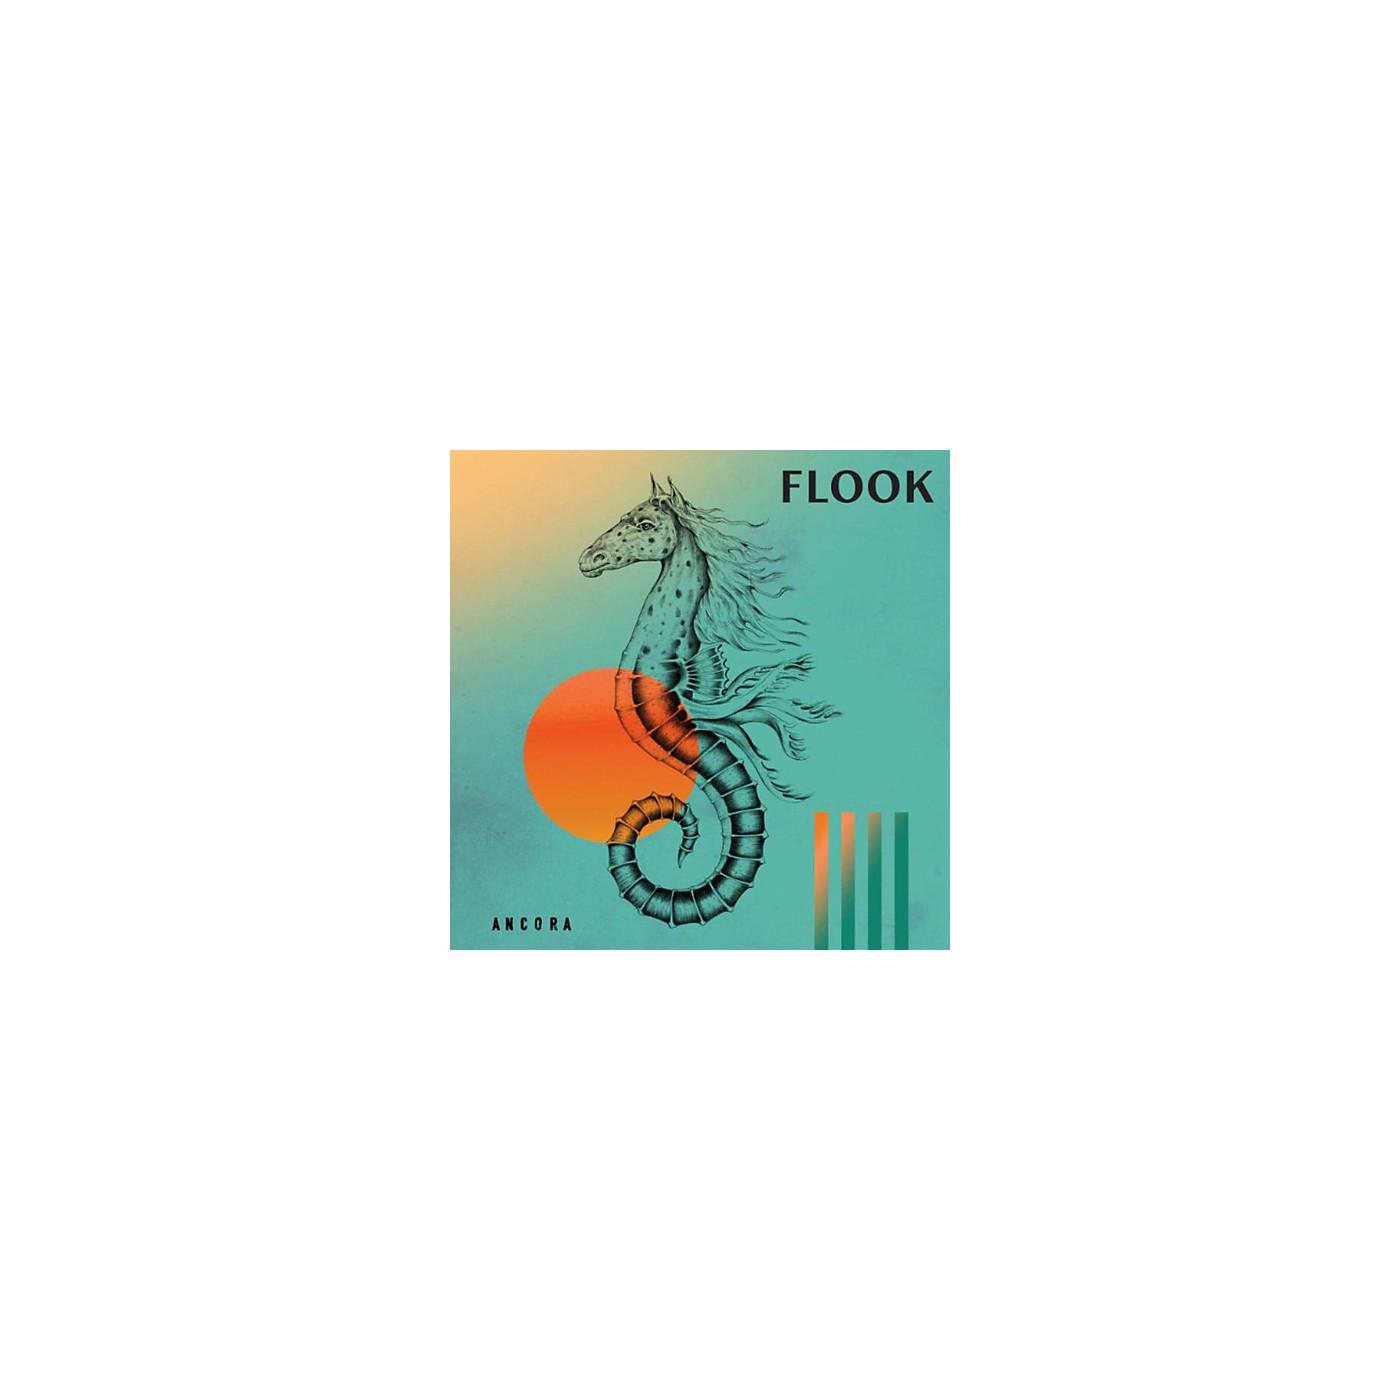 Alliance Flook - Ancora (Limited 500 Orange vinyl) thumbnail